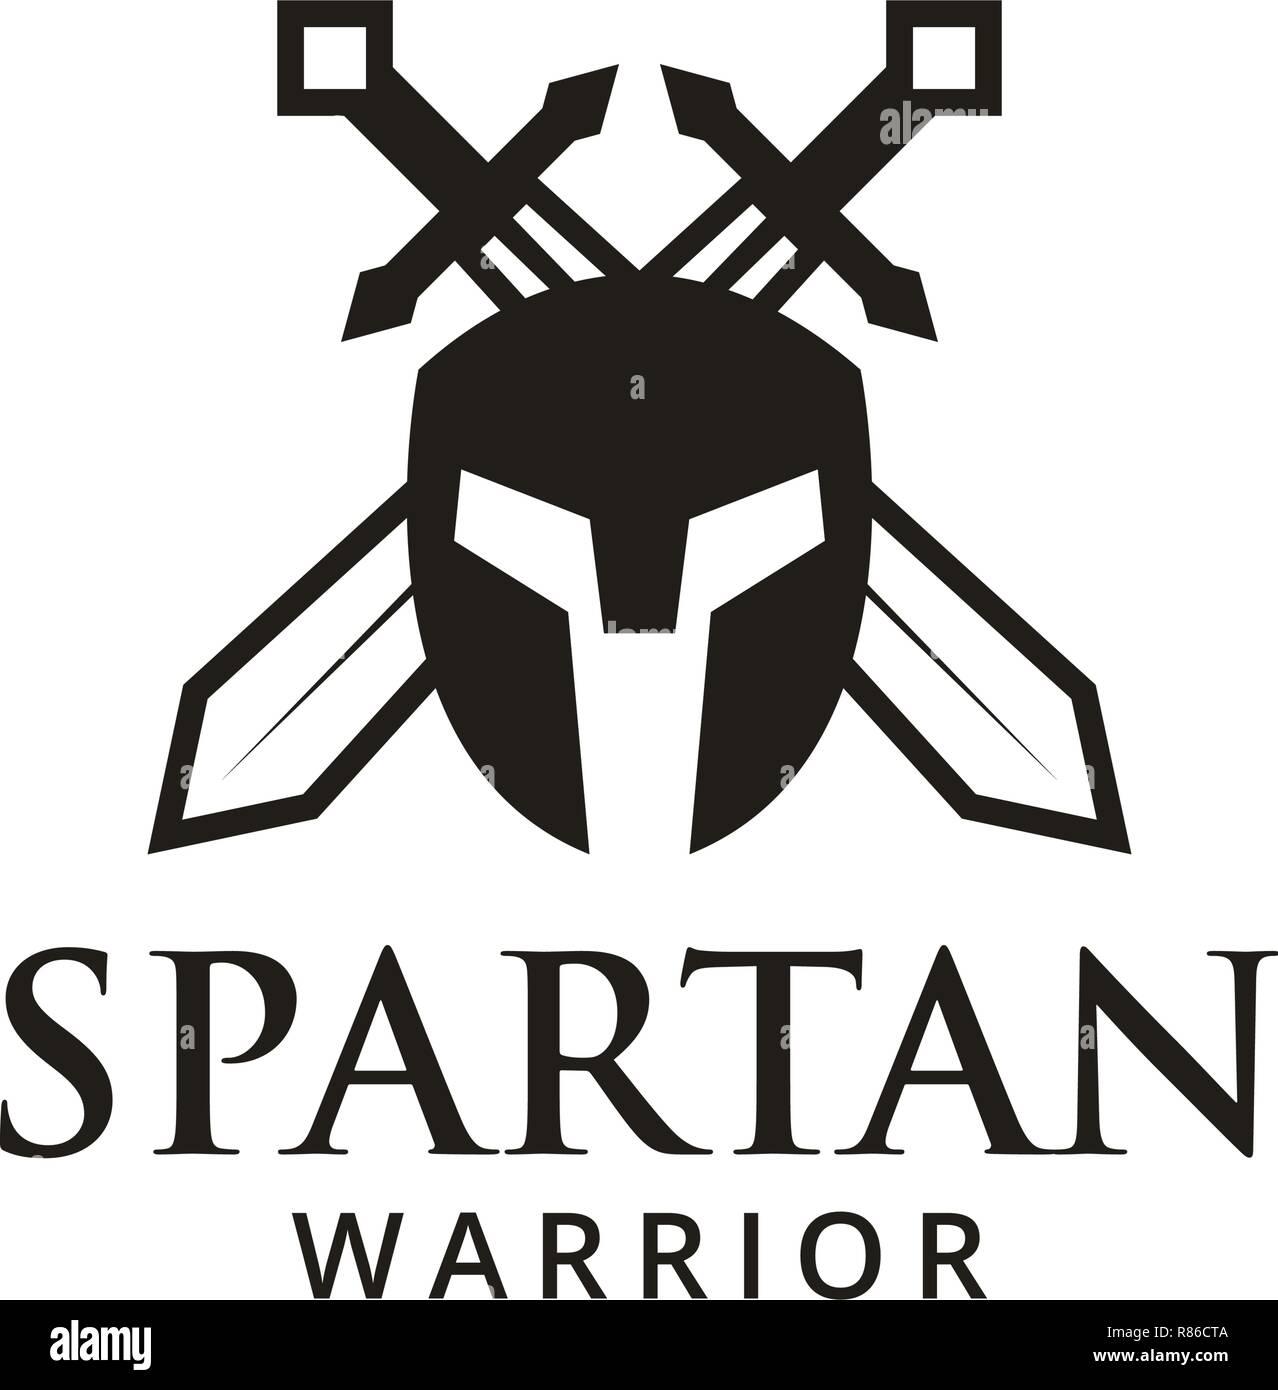 03ce0325bbd92 Spartan warrior logo design template vector illustration Stock ...